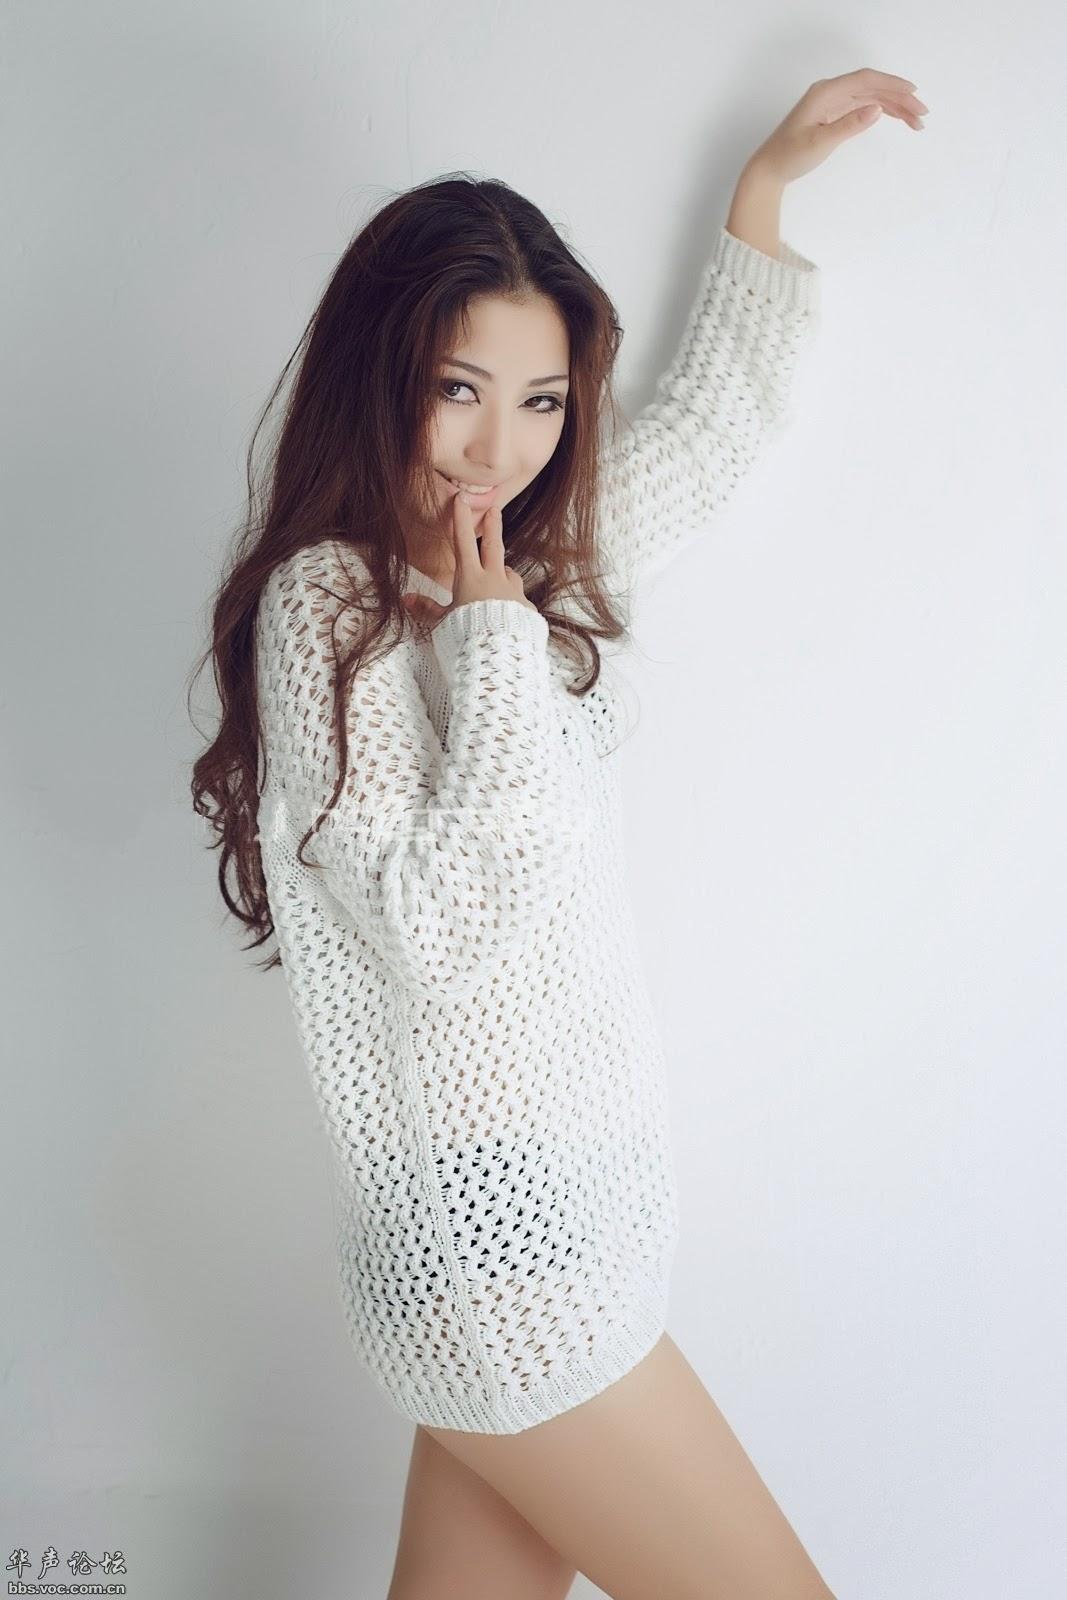 Korean beautiful girl yuu konishi yuu konishi korean watch or download full hd at httpsshrtzmeump5gch6 - 1 1